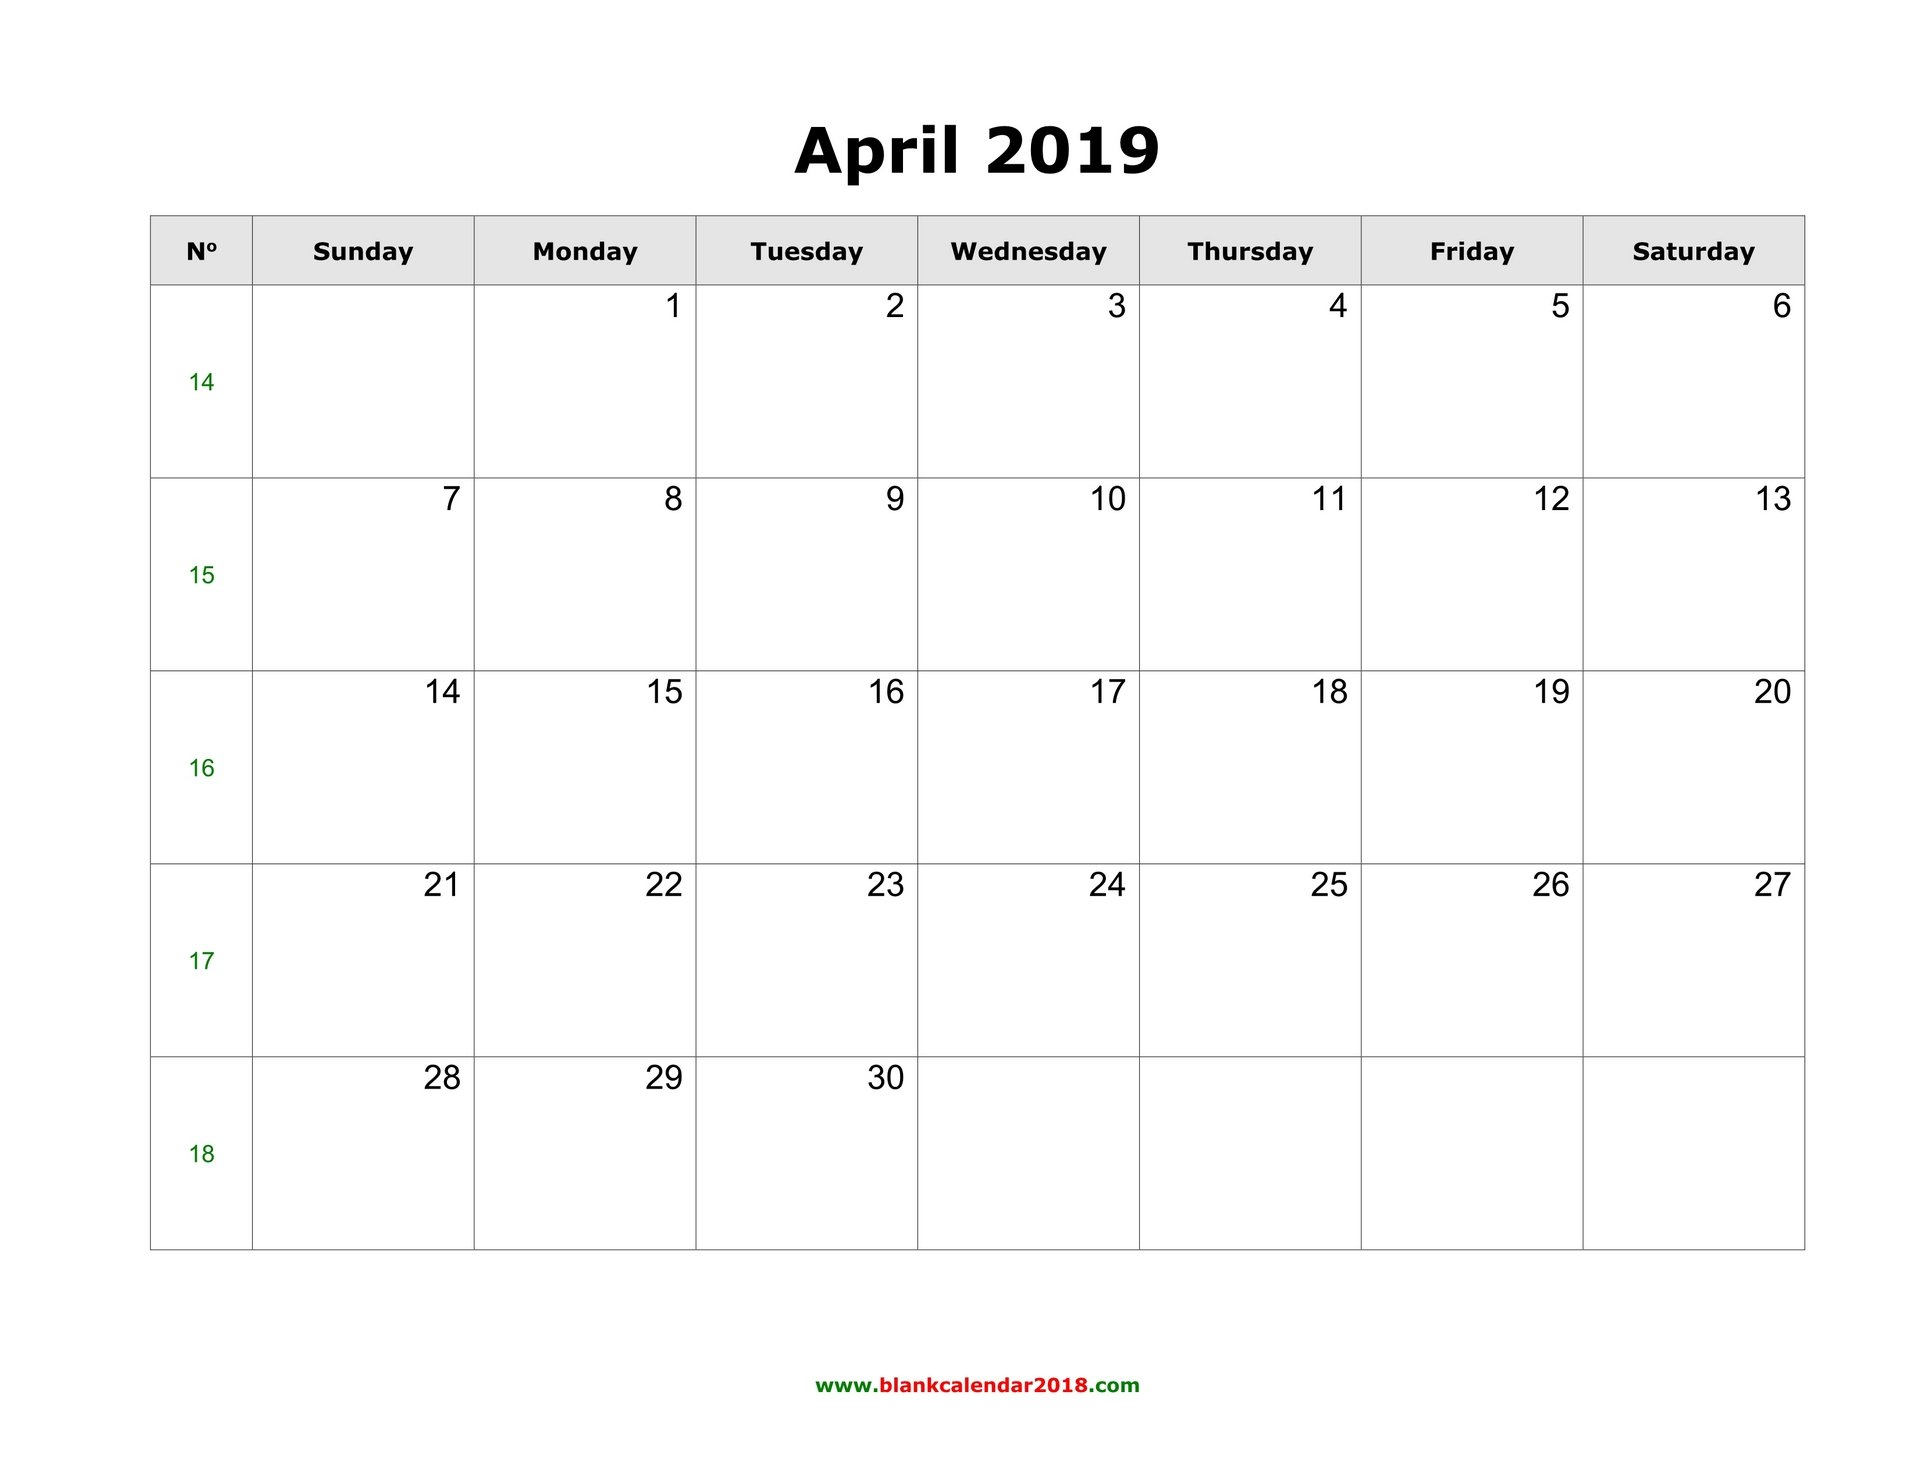 Blank Calendar For April 2019 Calendar Bulan 6 2019